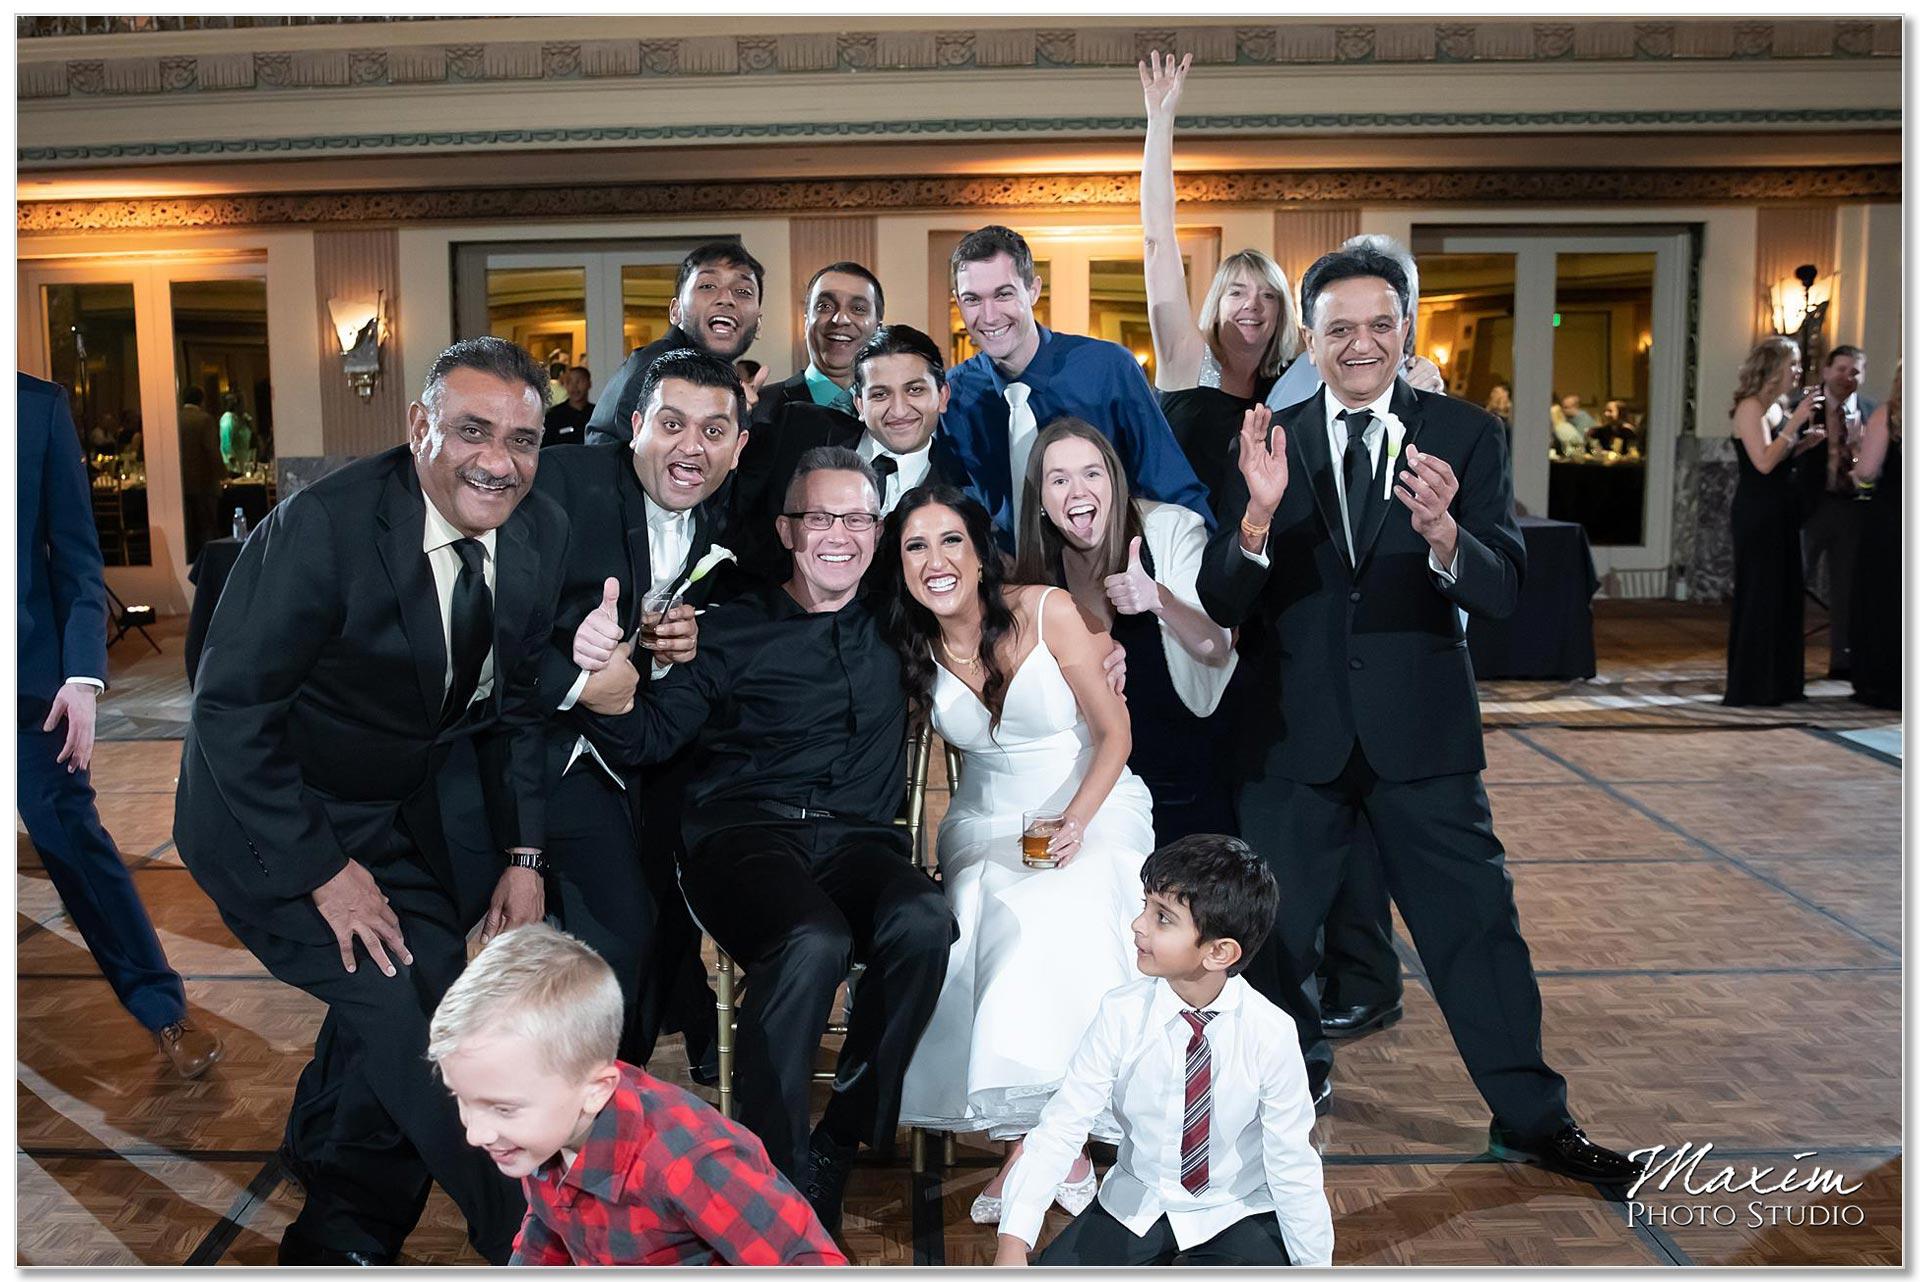 Hilton Netherland Plaza Cincinnati Wedding Hall of Mirrors Photo Bomb